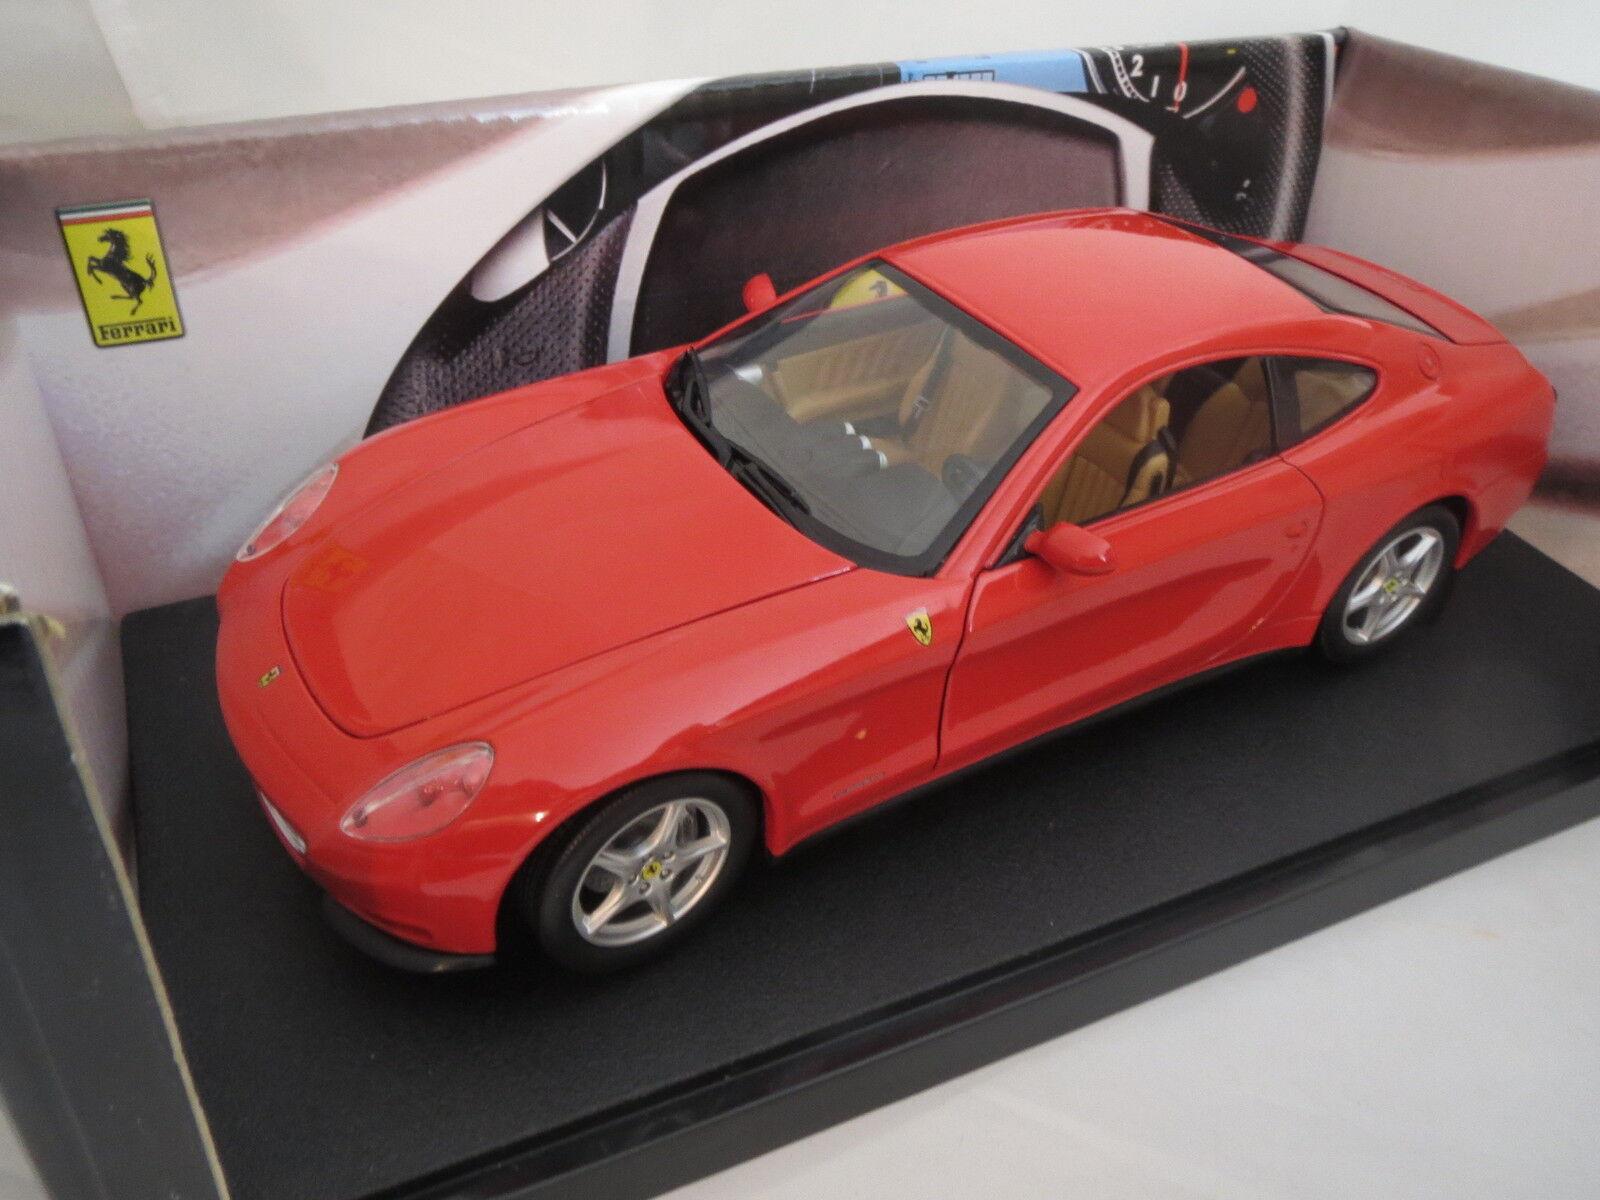 Hotwheels ferrari 612 Scaglietti (rojo) 1 18 embalaje original